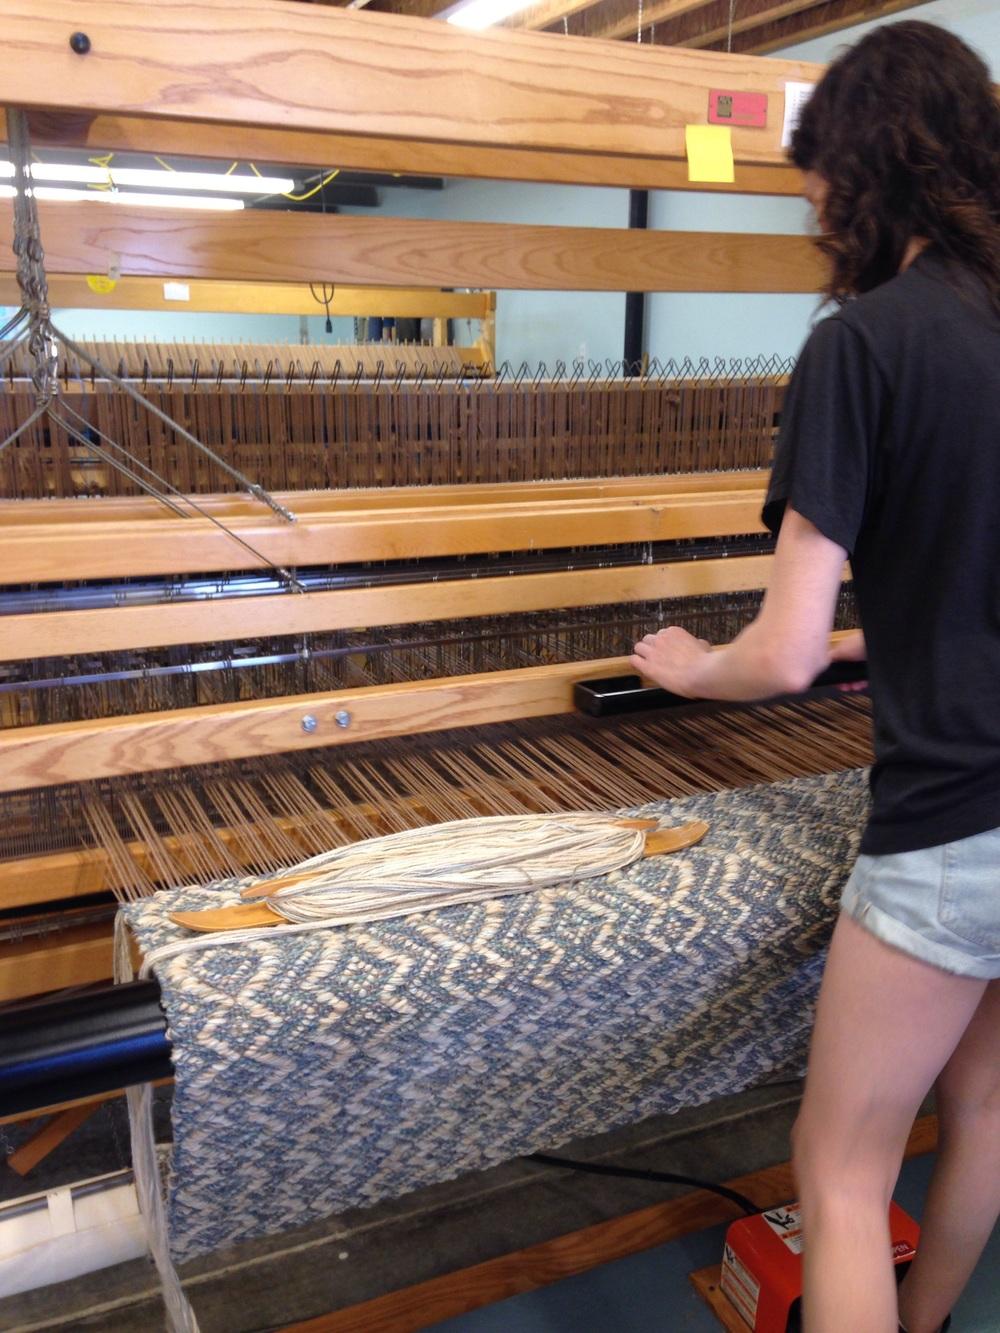 Meg weaving a handwoven rug.